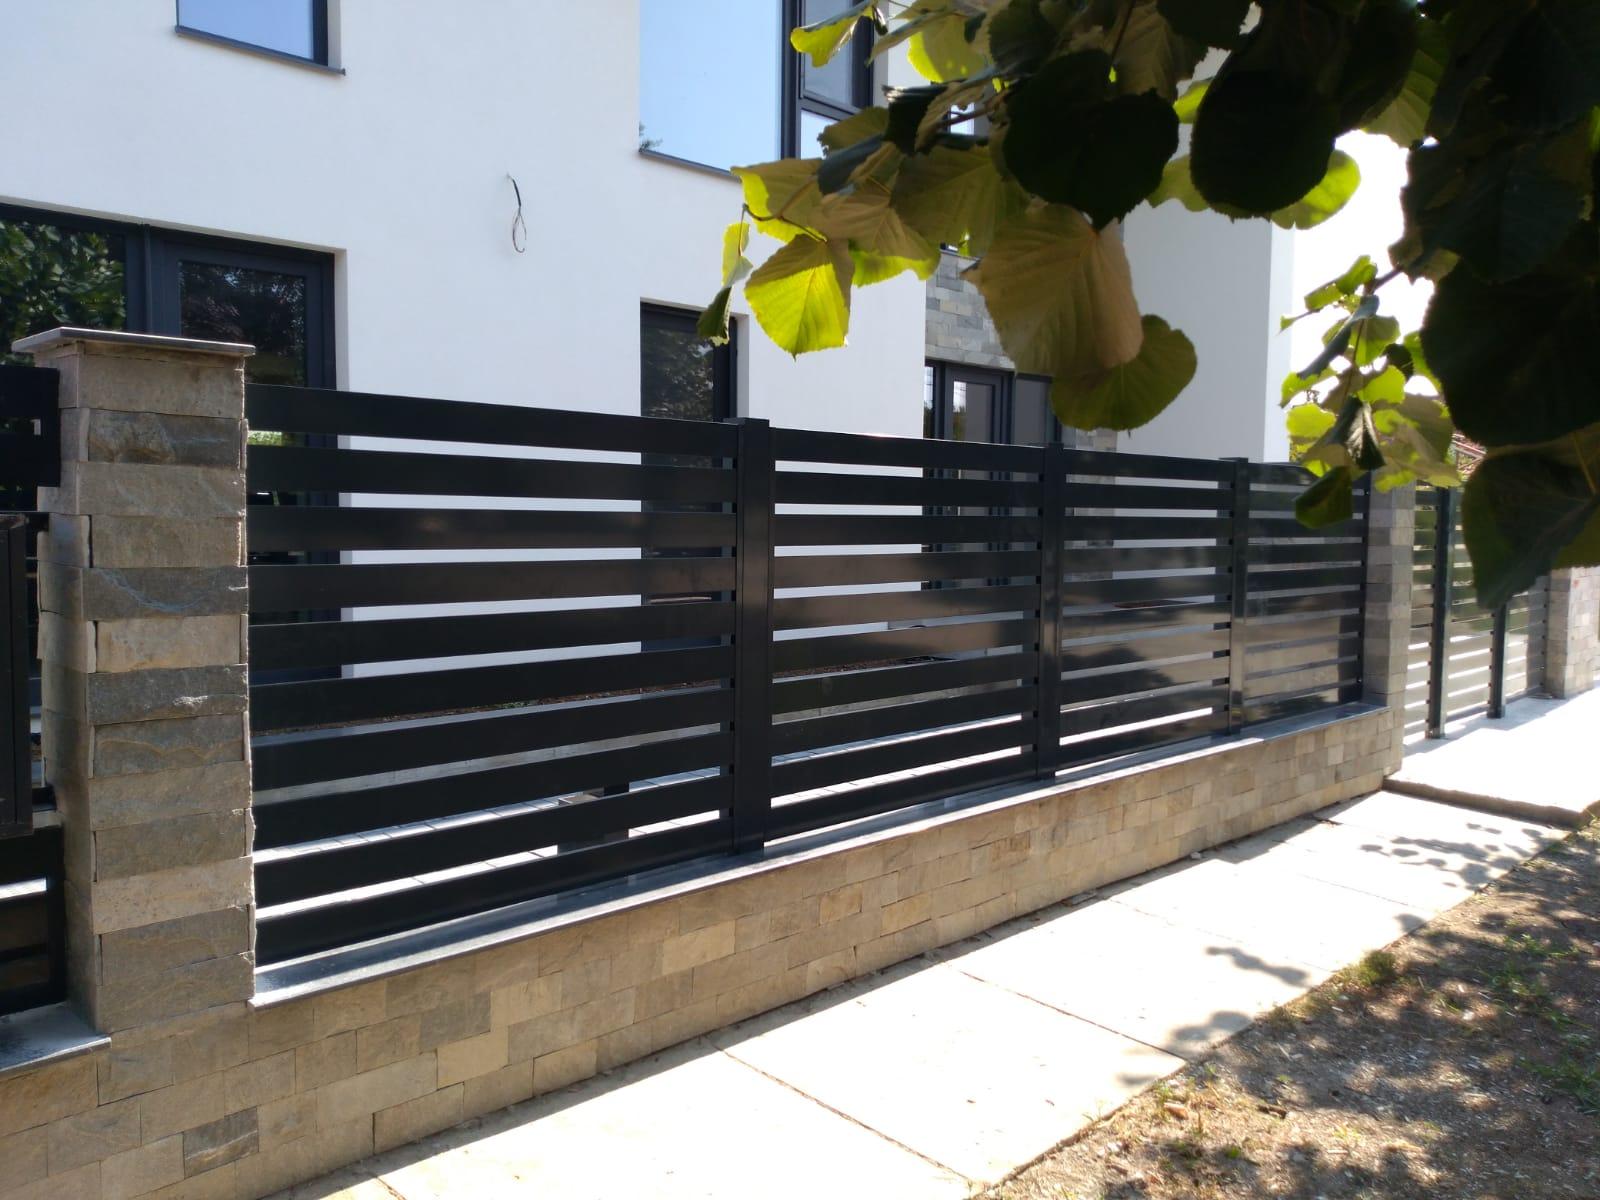 montarea gardurilor,balustradelor si portilor din aluminiu.